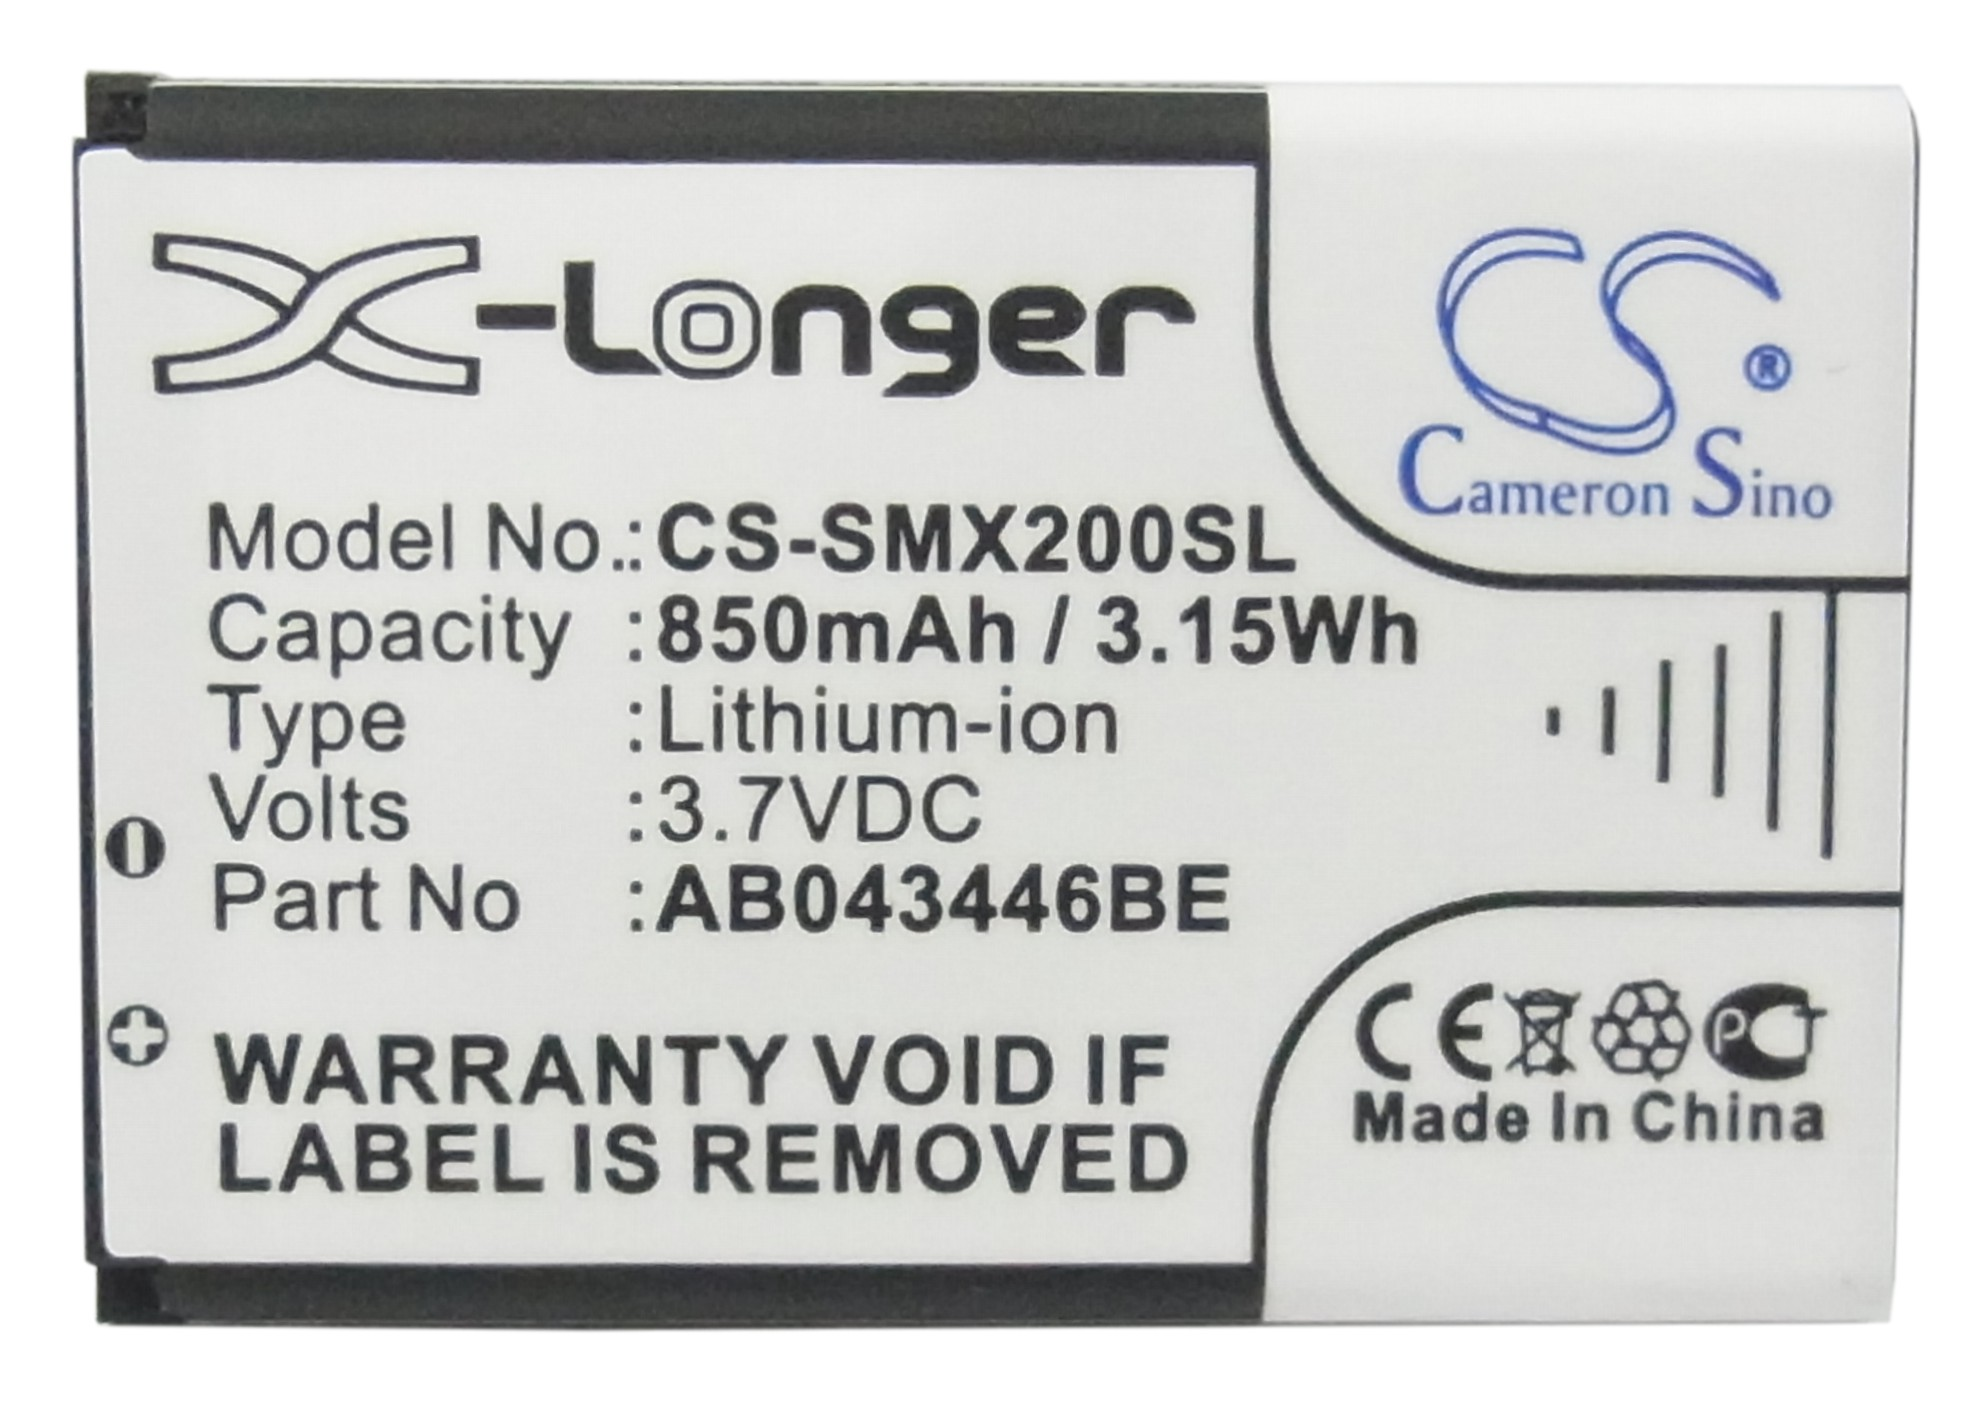 Cameron Sino 850mAh Battery for JOA Telecom L210, L-210